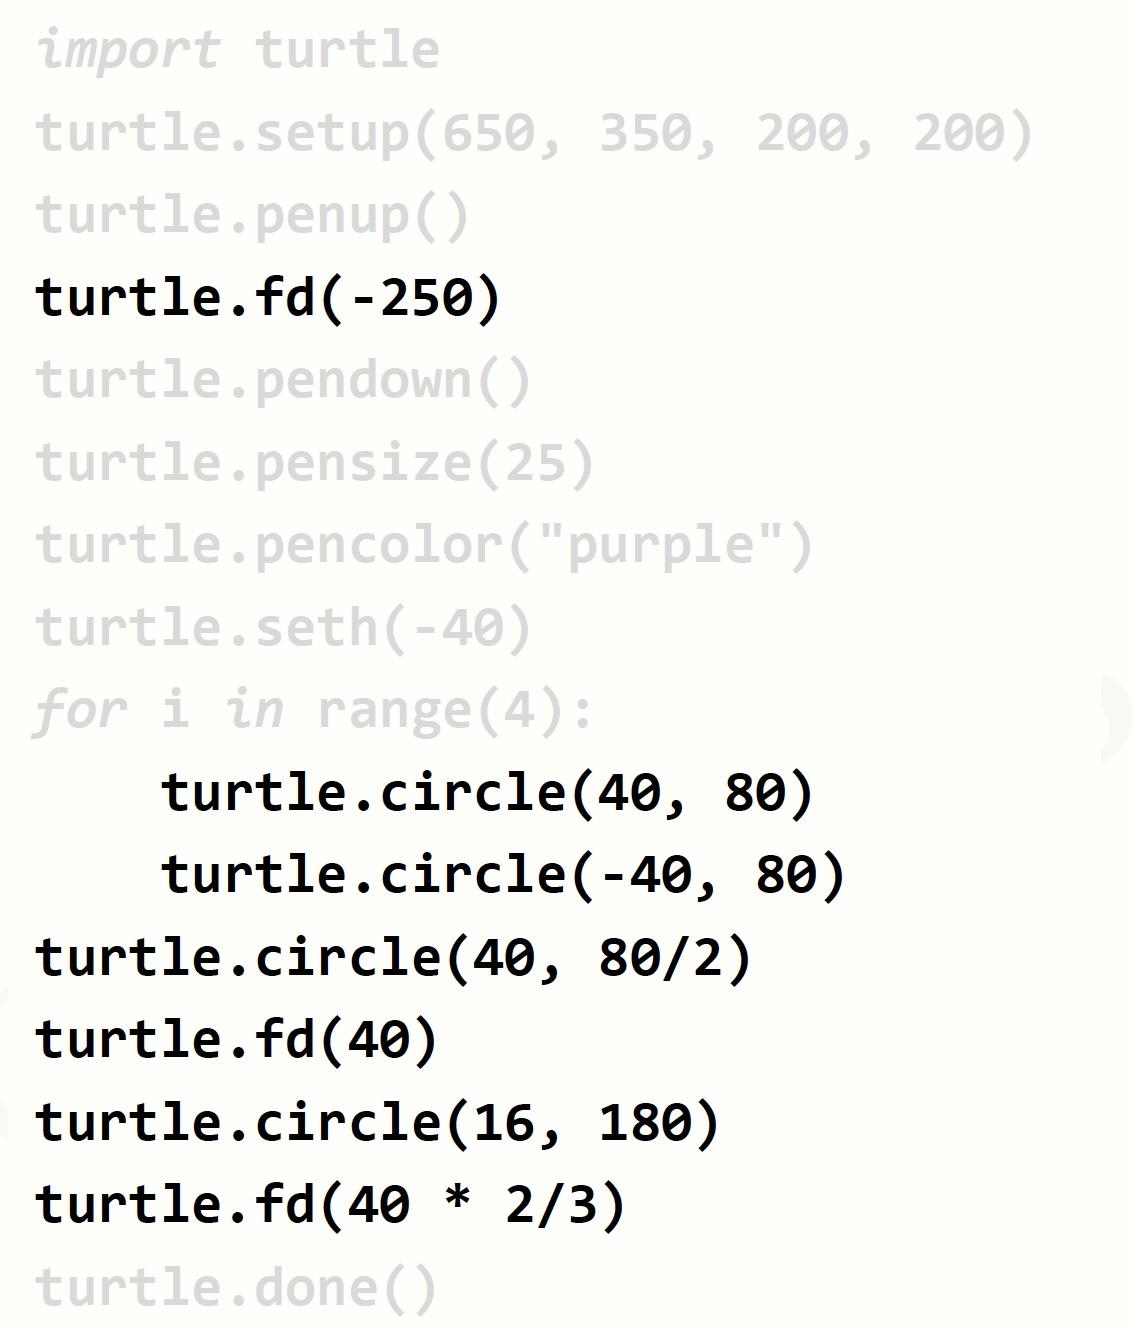 013-turtle程序语法元素分析-06.jpg?x-oss-process=style/watermark